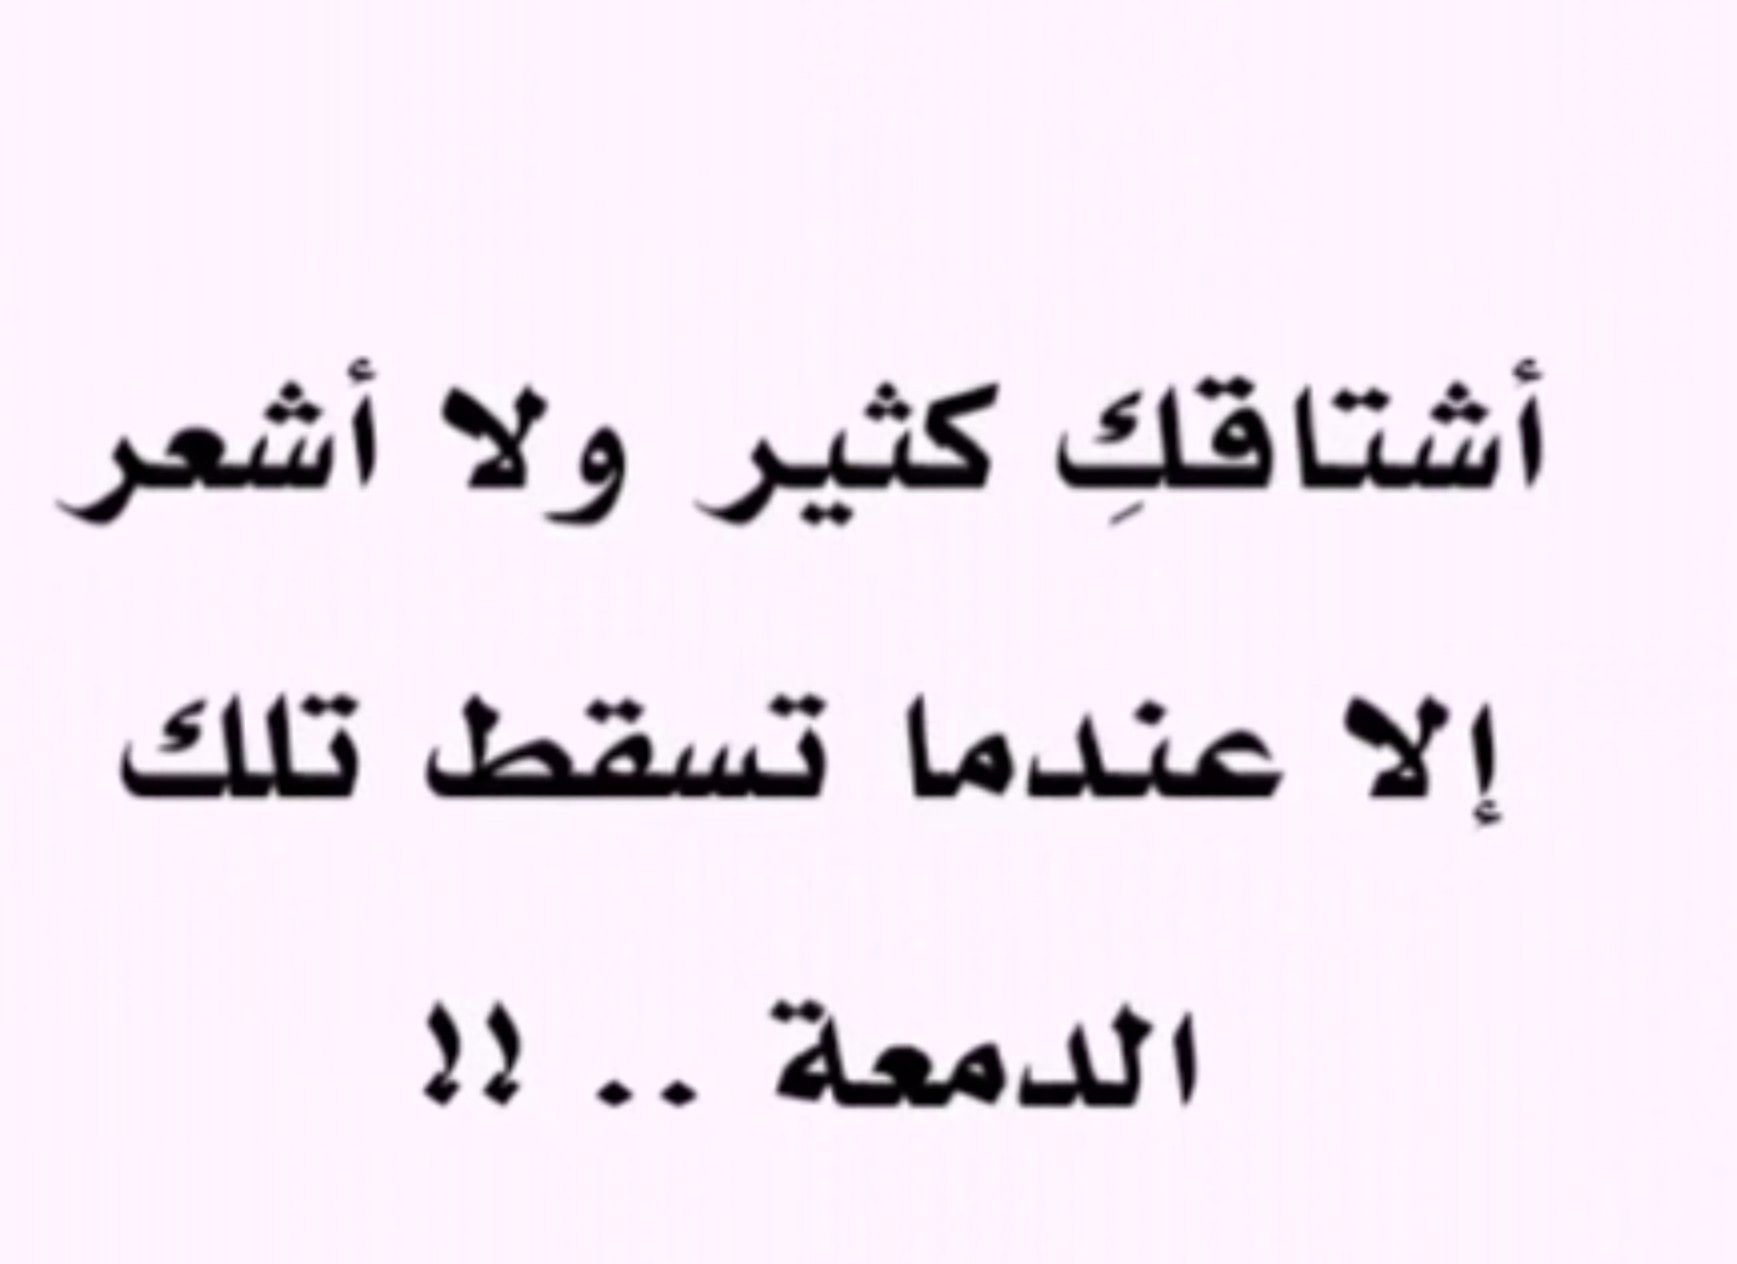 اشتقت لك يا نور عيني Math Math Equations Arabic Calligraphy